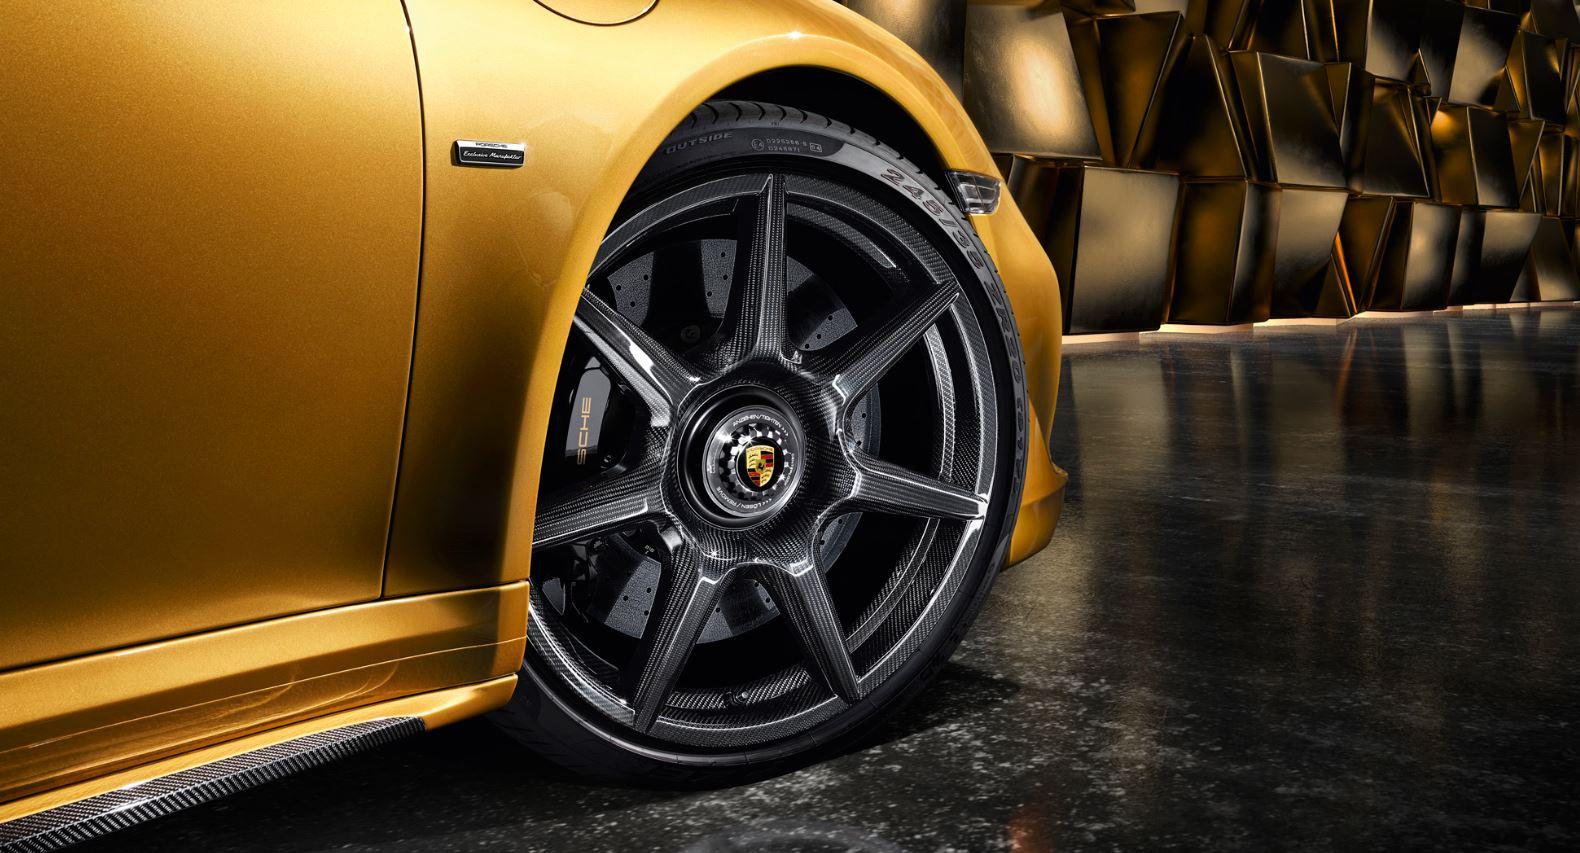 Llantas-fibra-de-carbono-de-Porsche-2